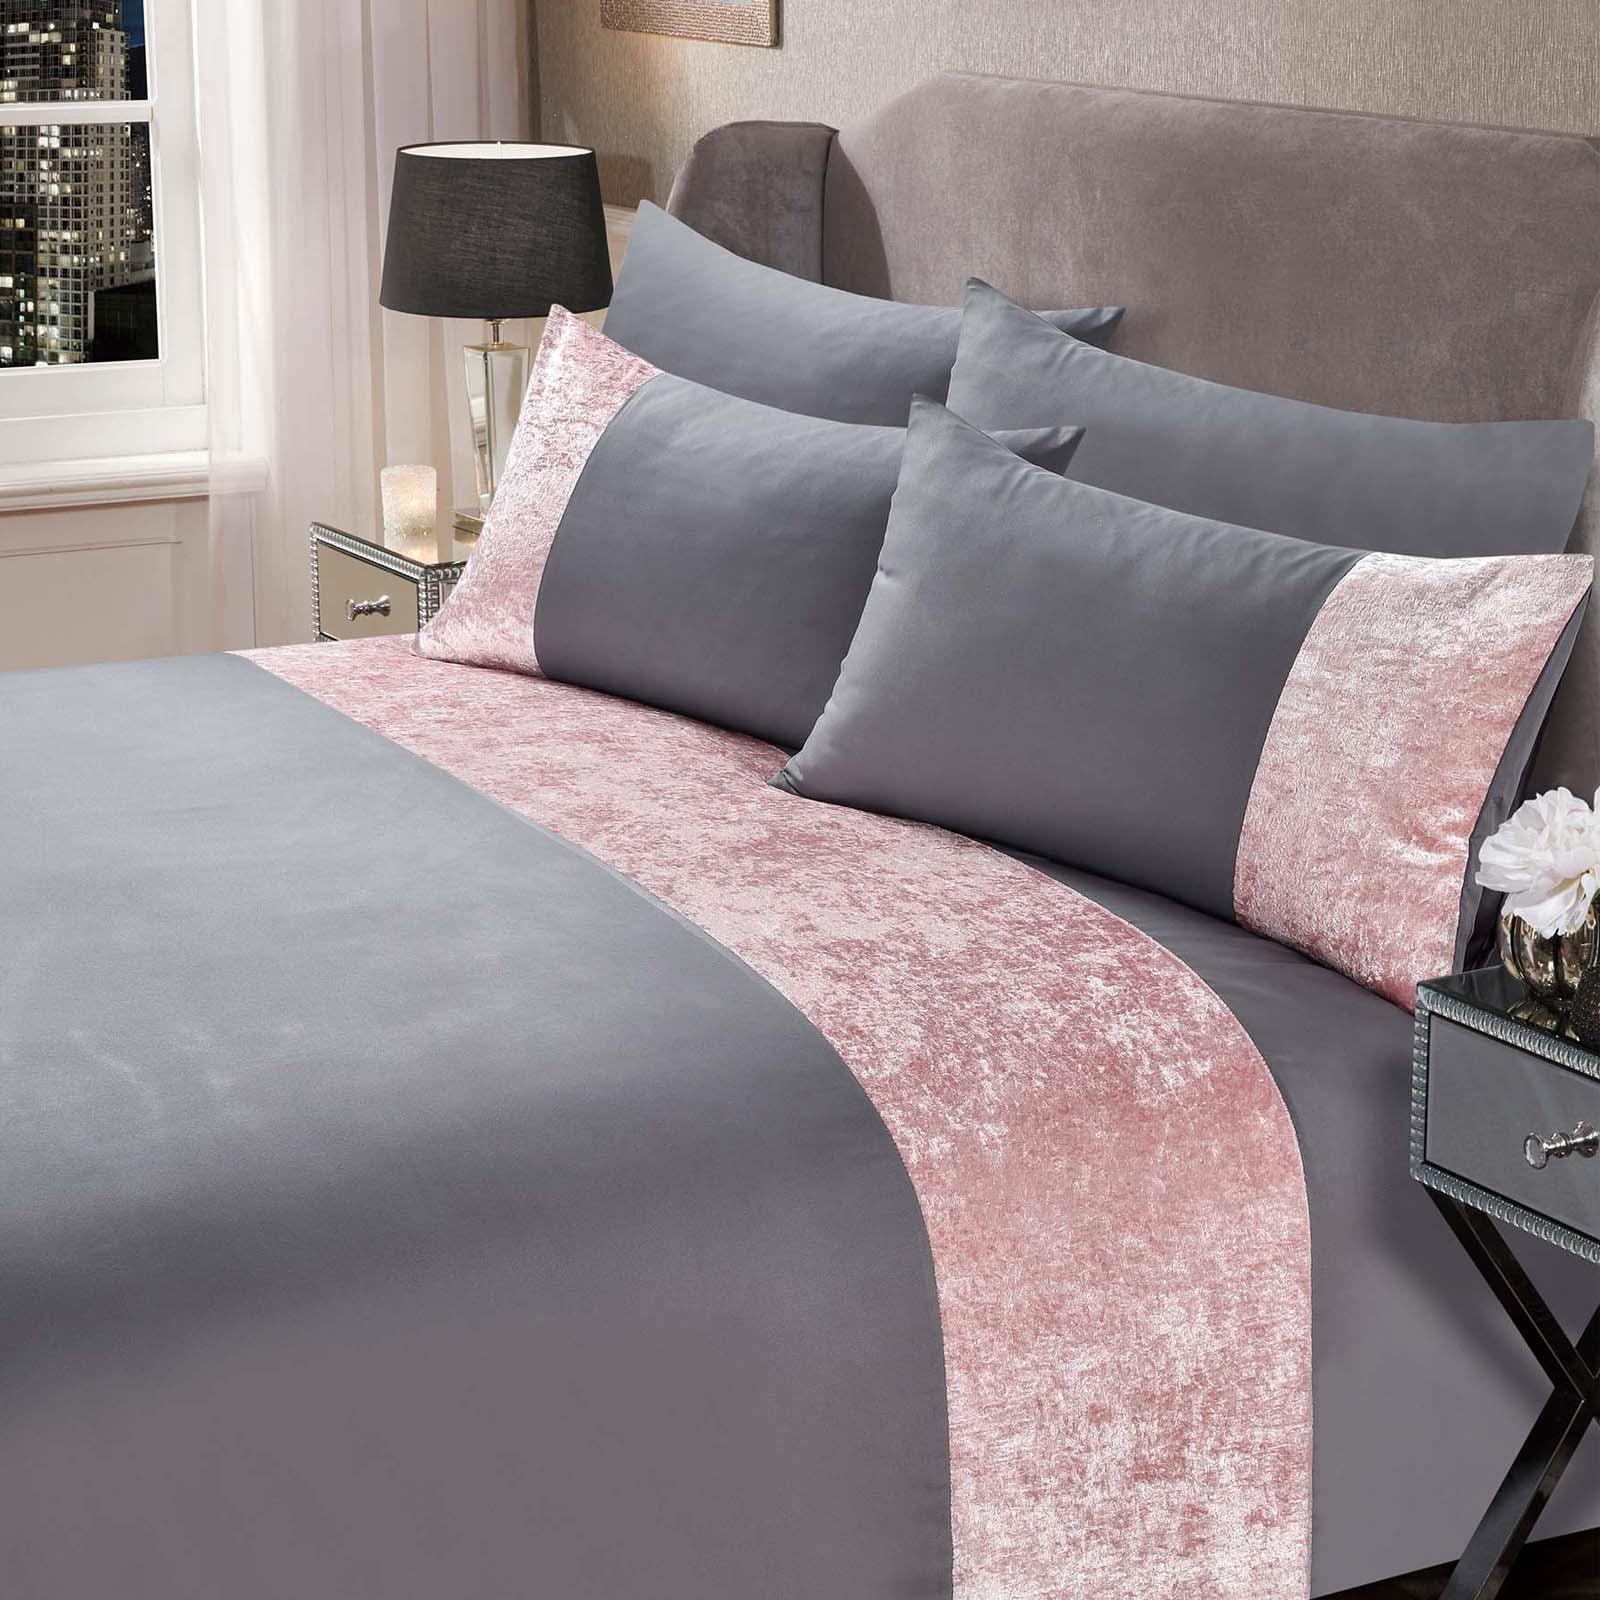 thumbnail 25 - Sienna Crushed Velvet Panel Duvet Cover with Pillow Case Bedding Set Silver Grey